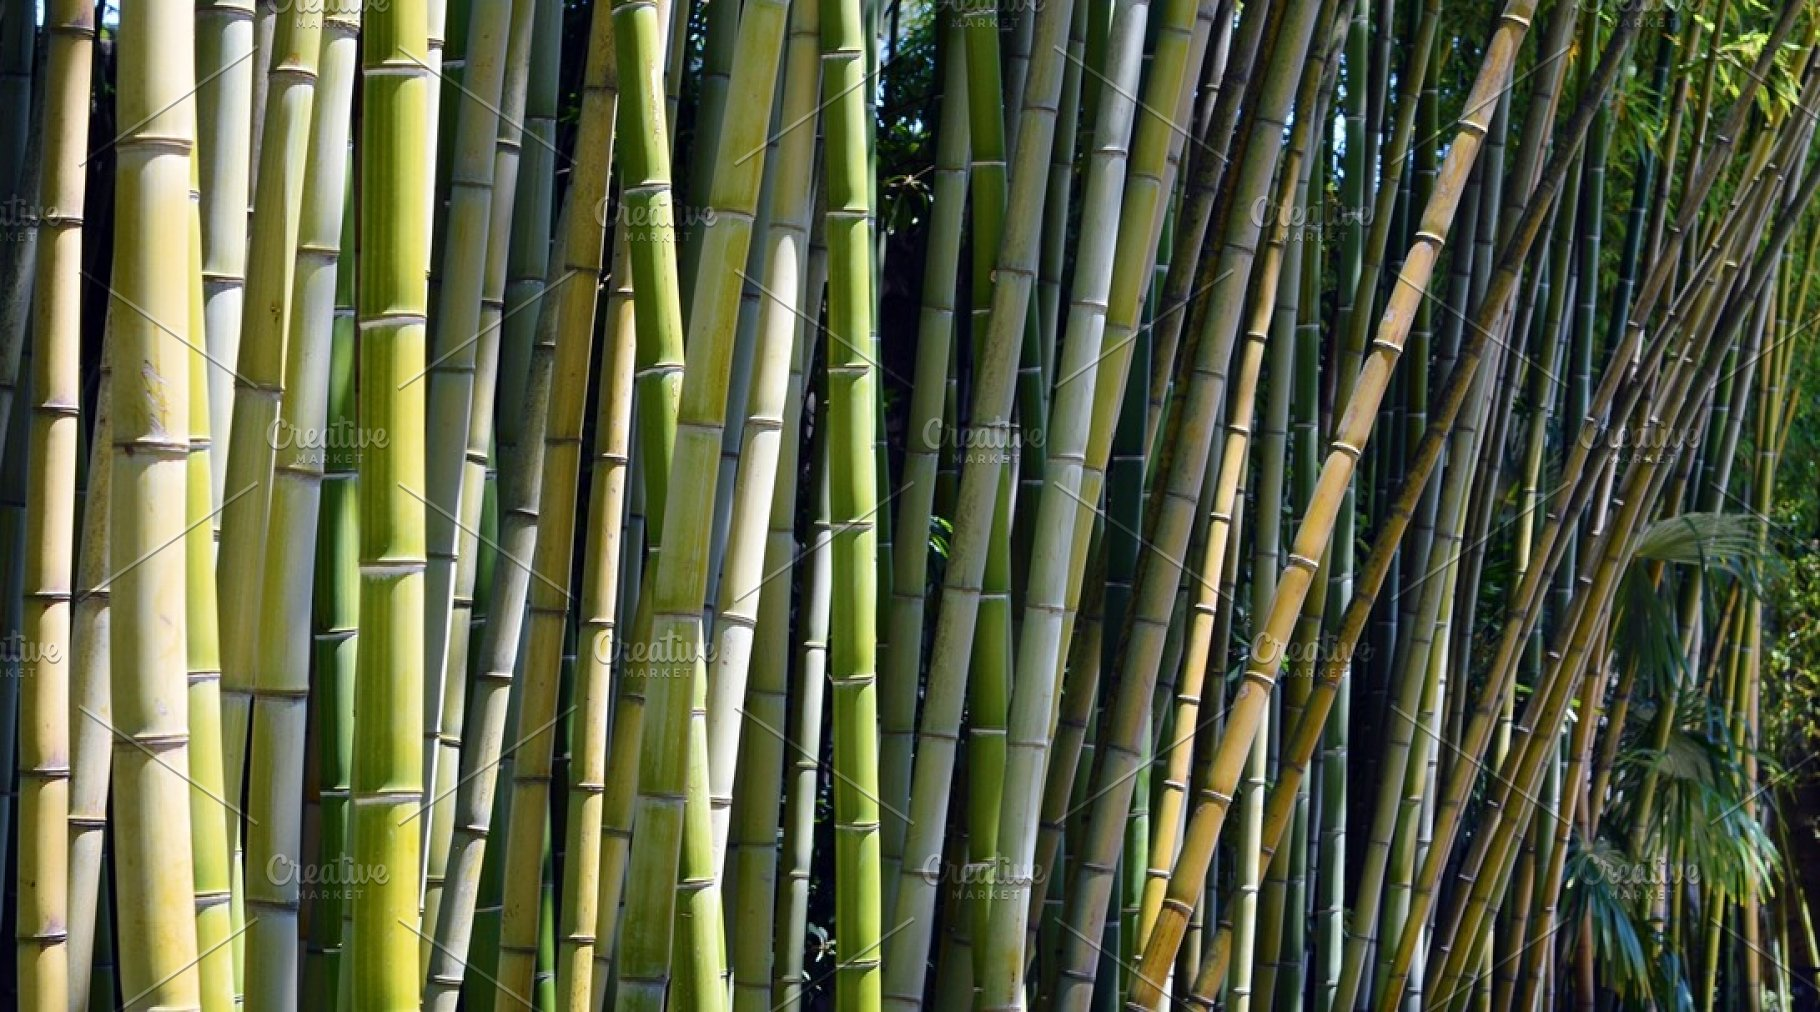 Bamboo Trees High Quality Nature Stock Photos Creative Market